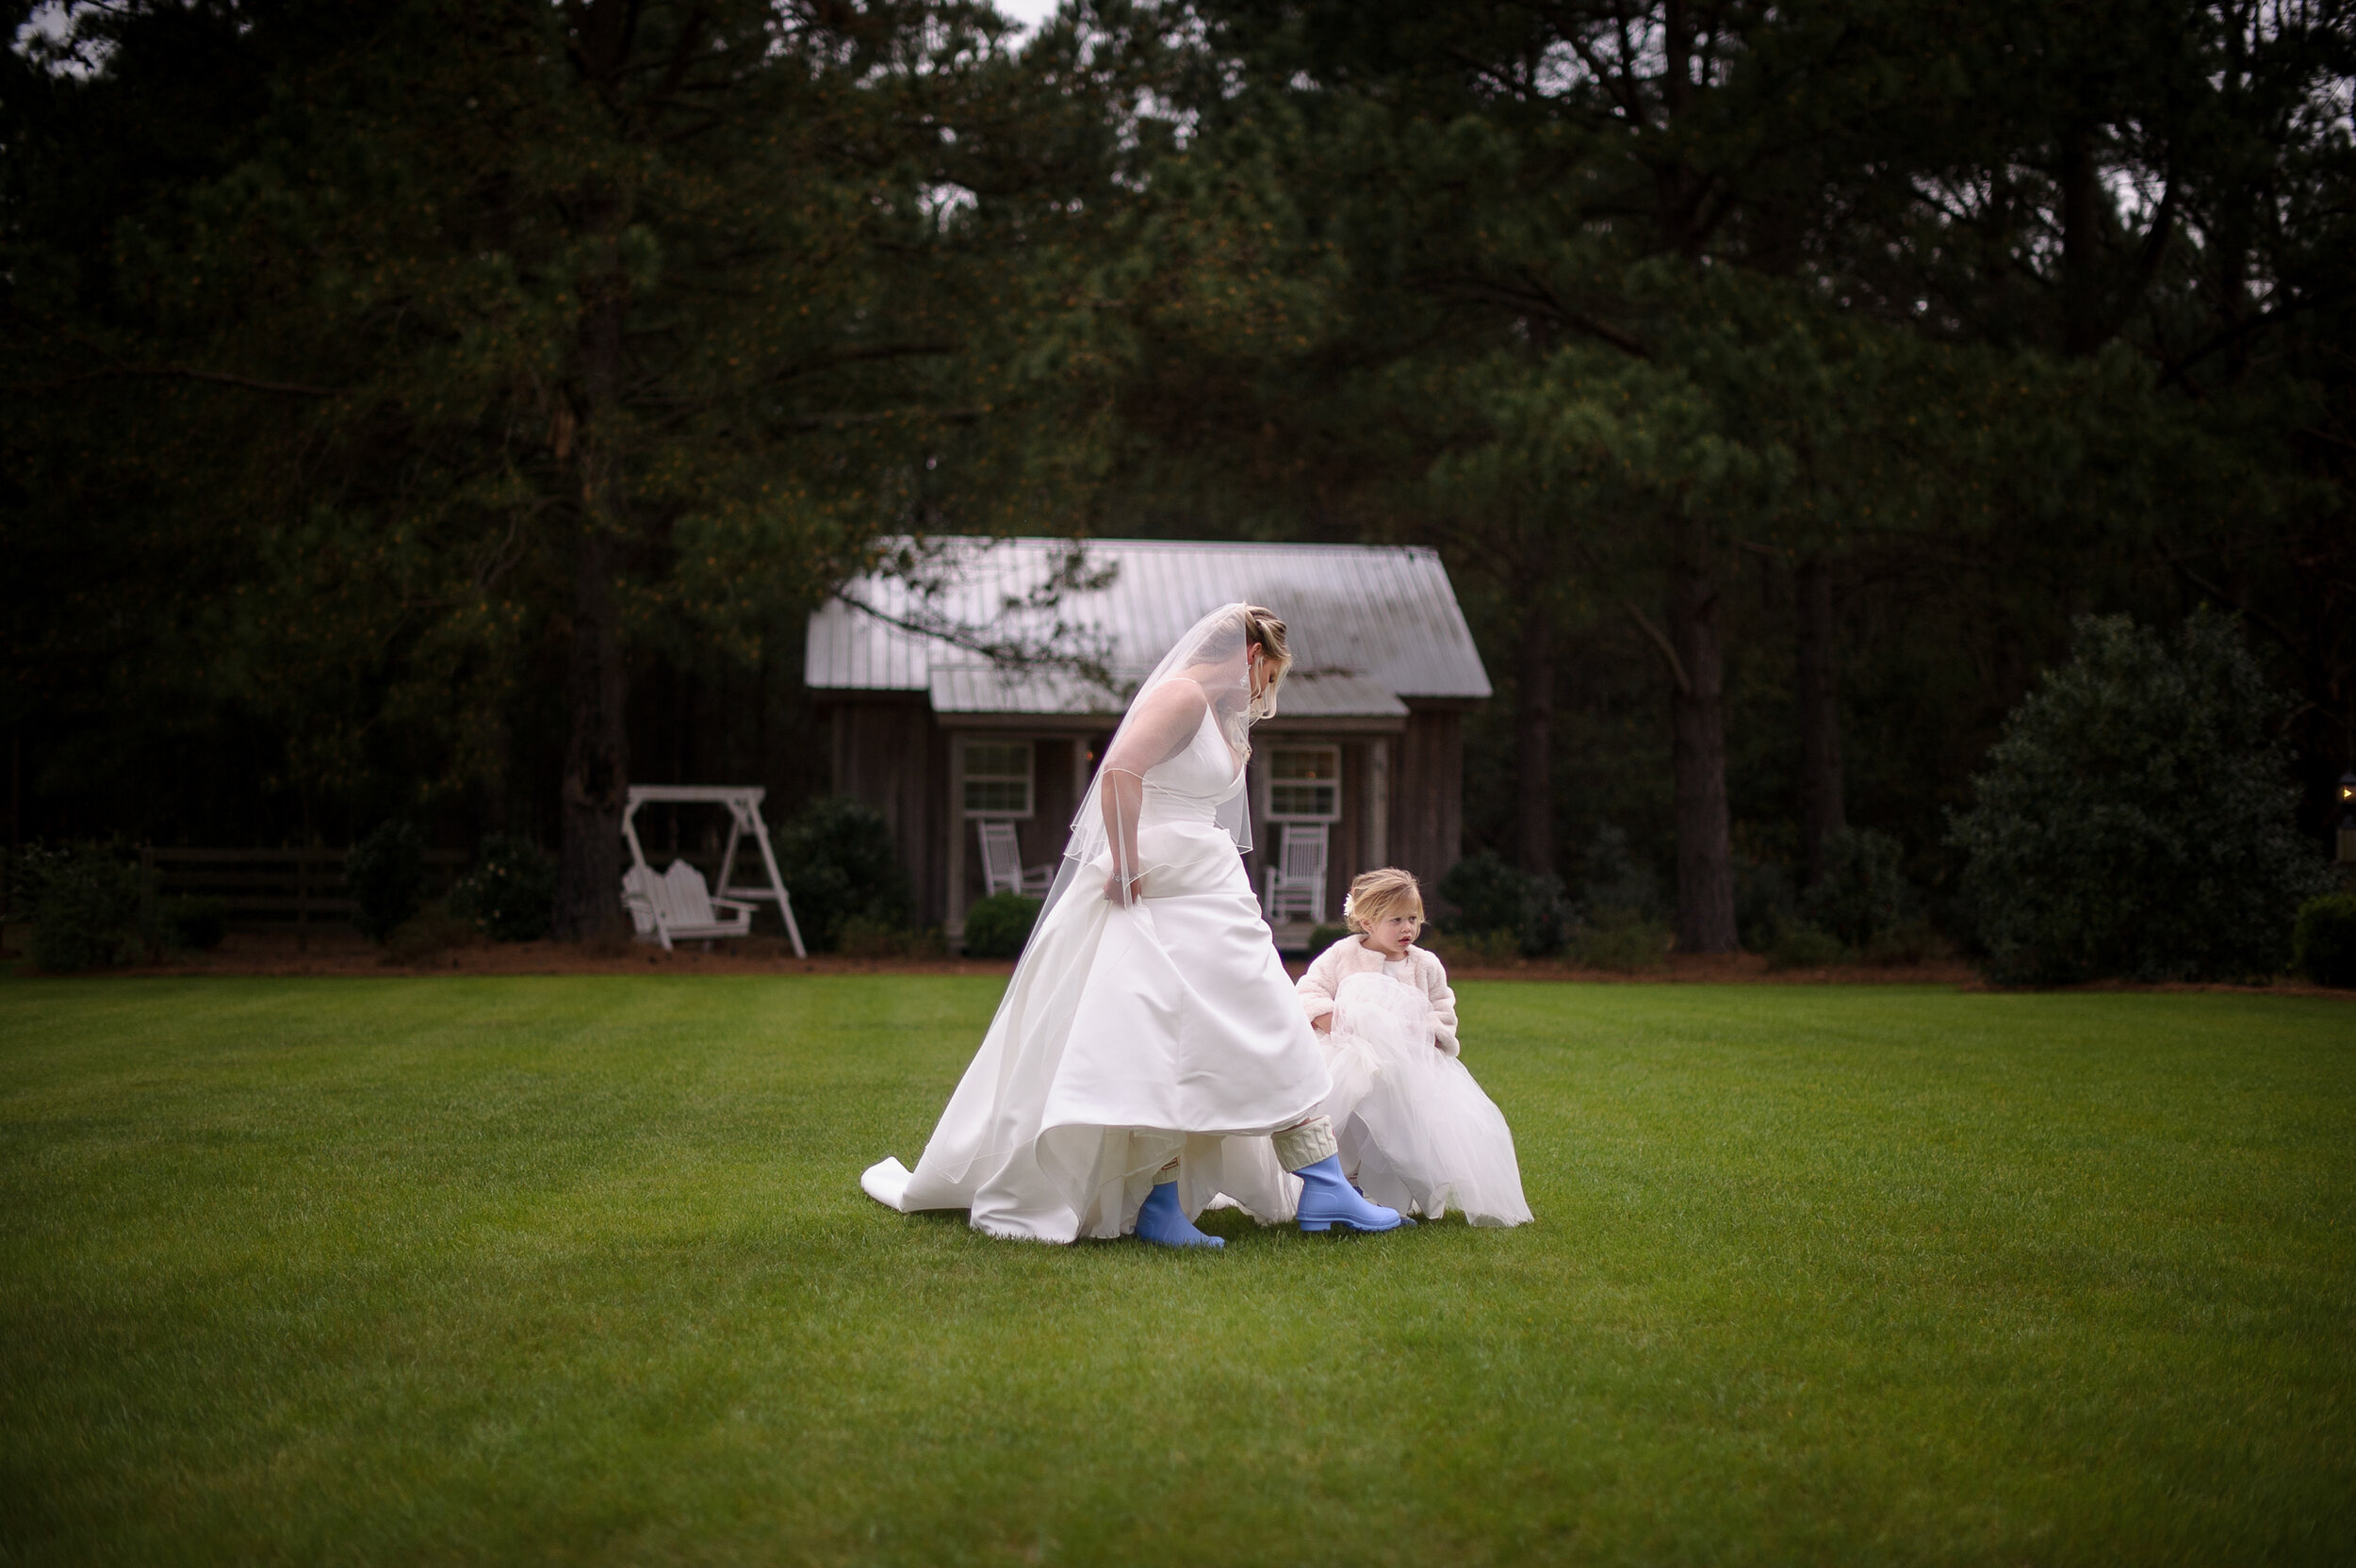 outdoorspringbarnwedding22.jpg